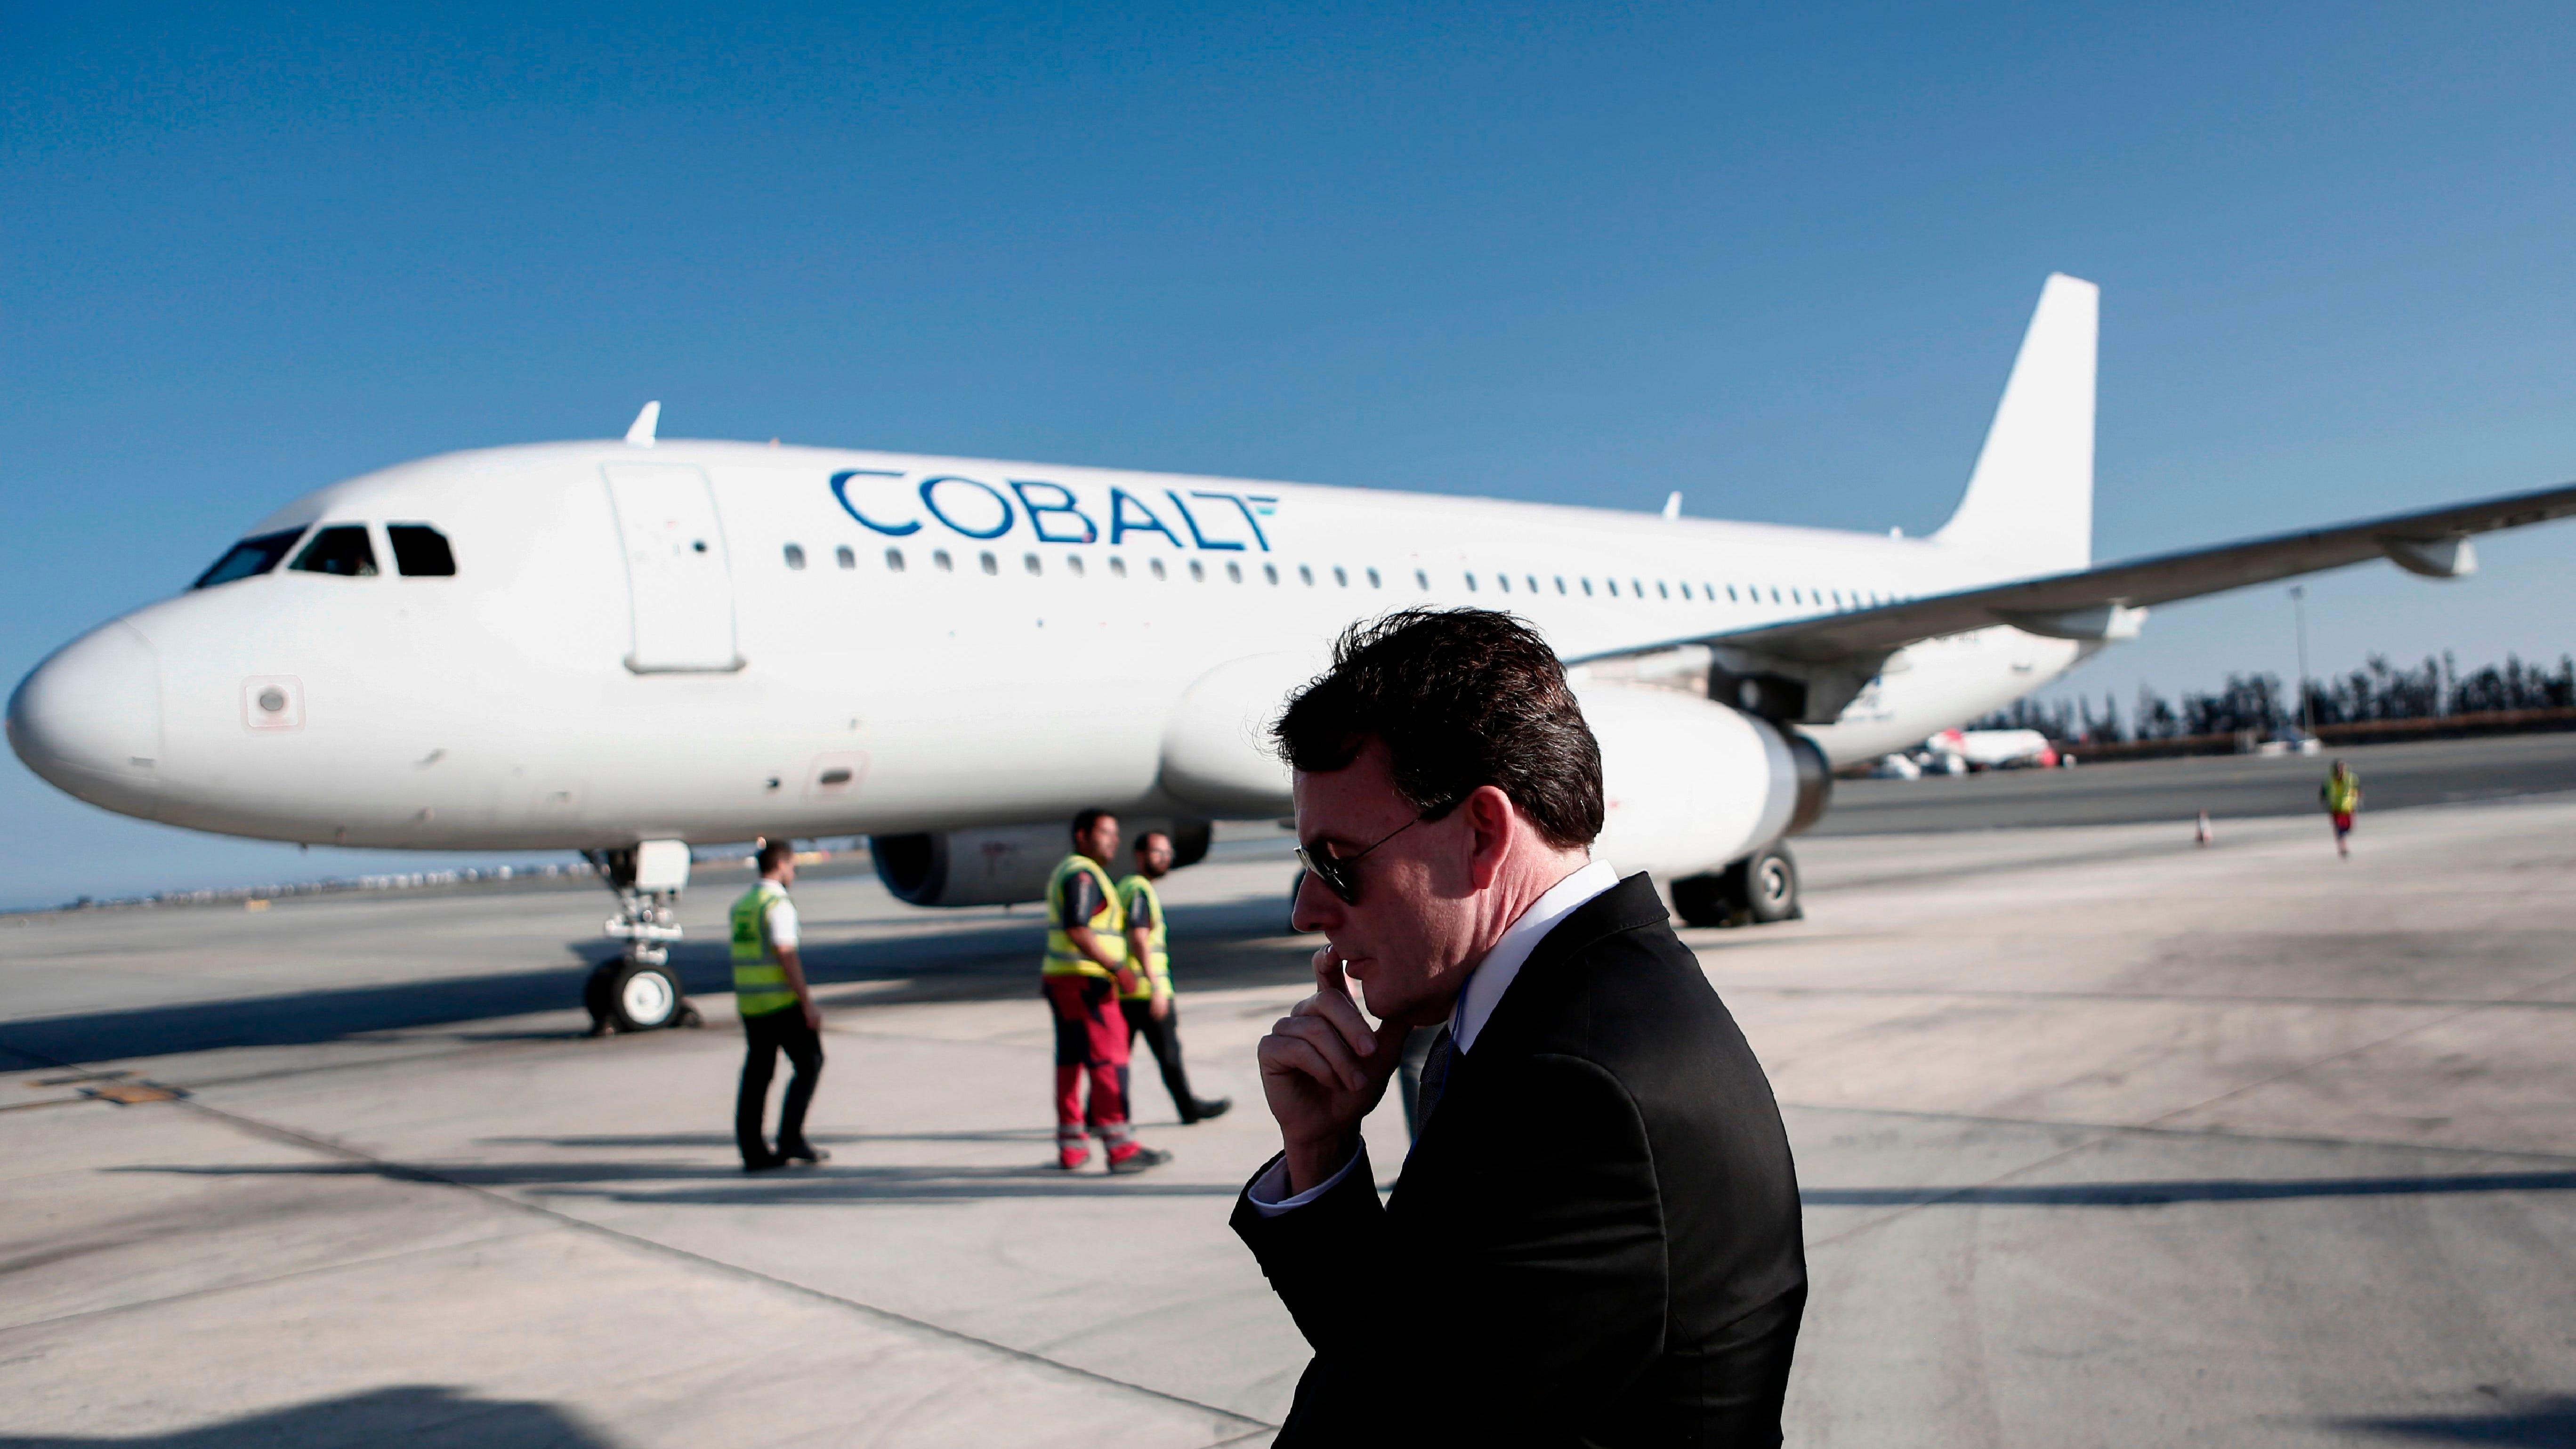 Cyprus airline Cobalt abruptly halts flights